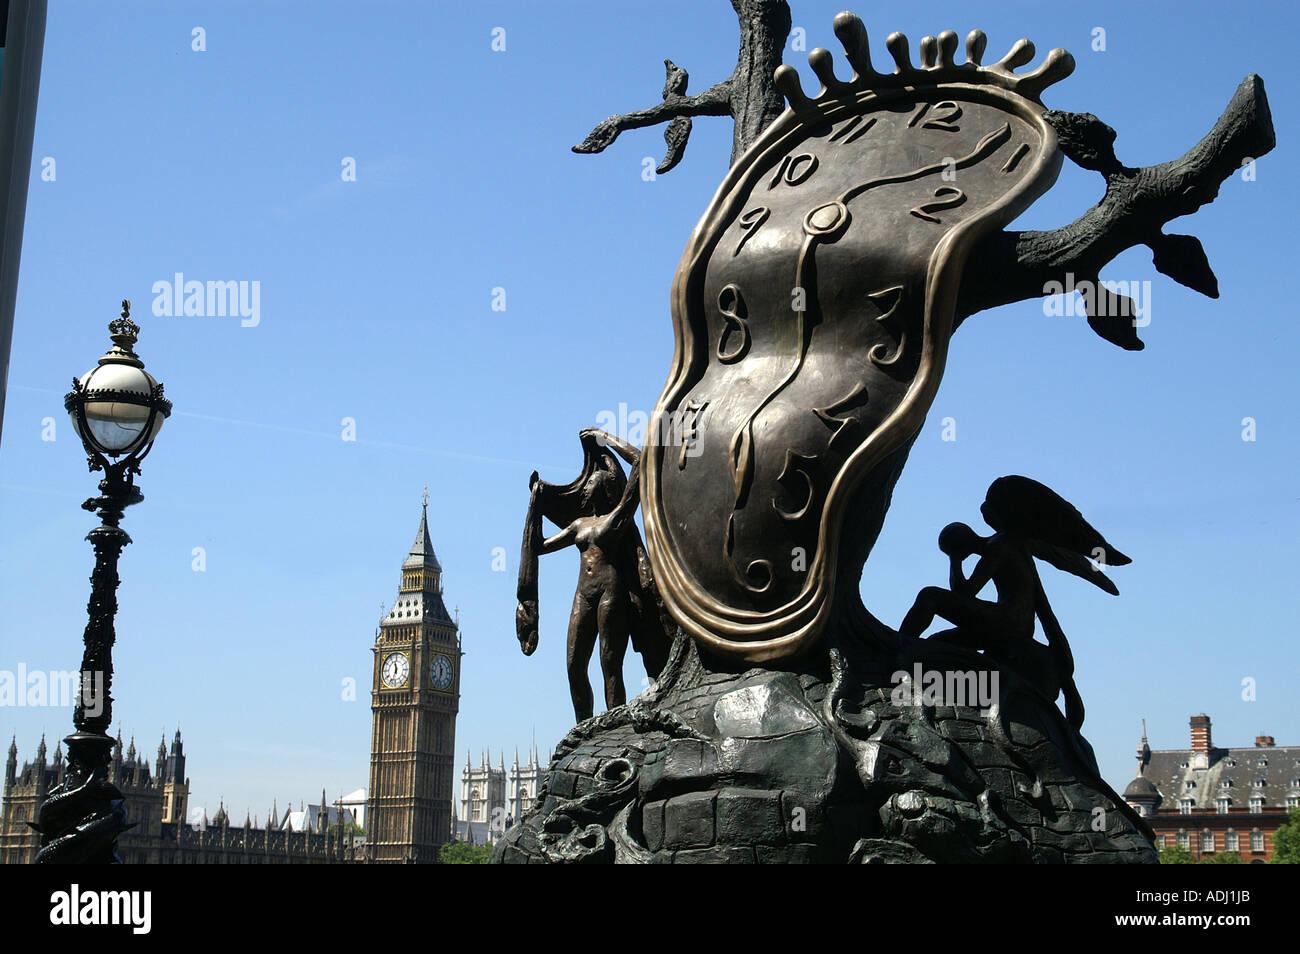 Salvador Dali artwork bronze sculpture next to river Thames London - Stock Image